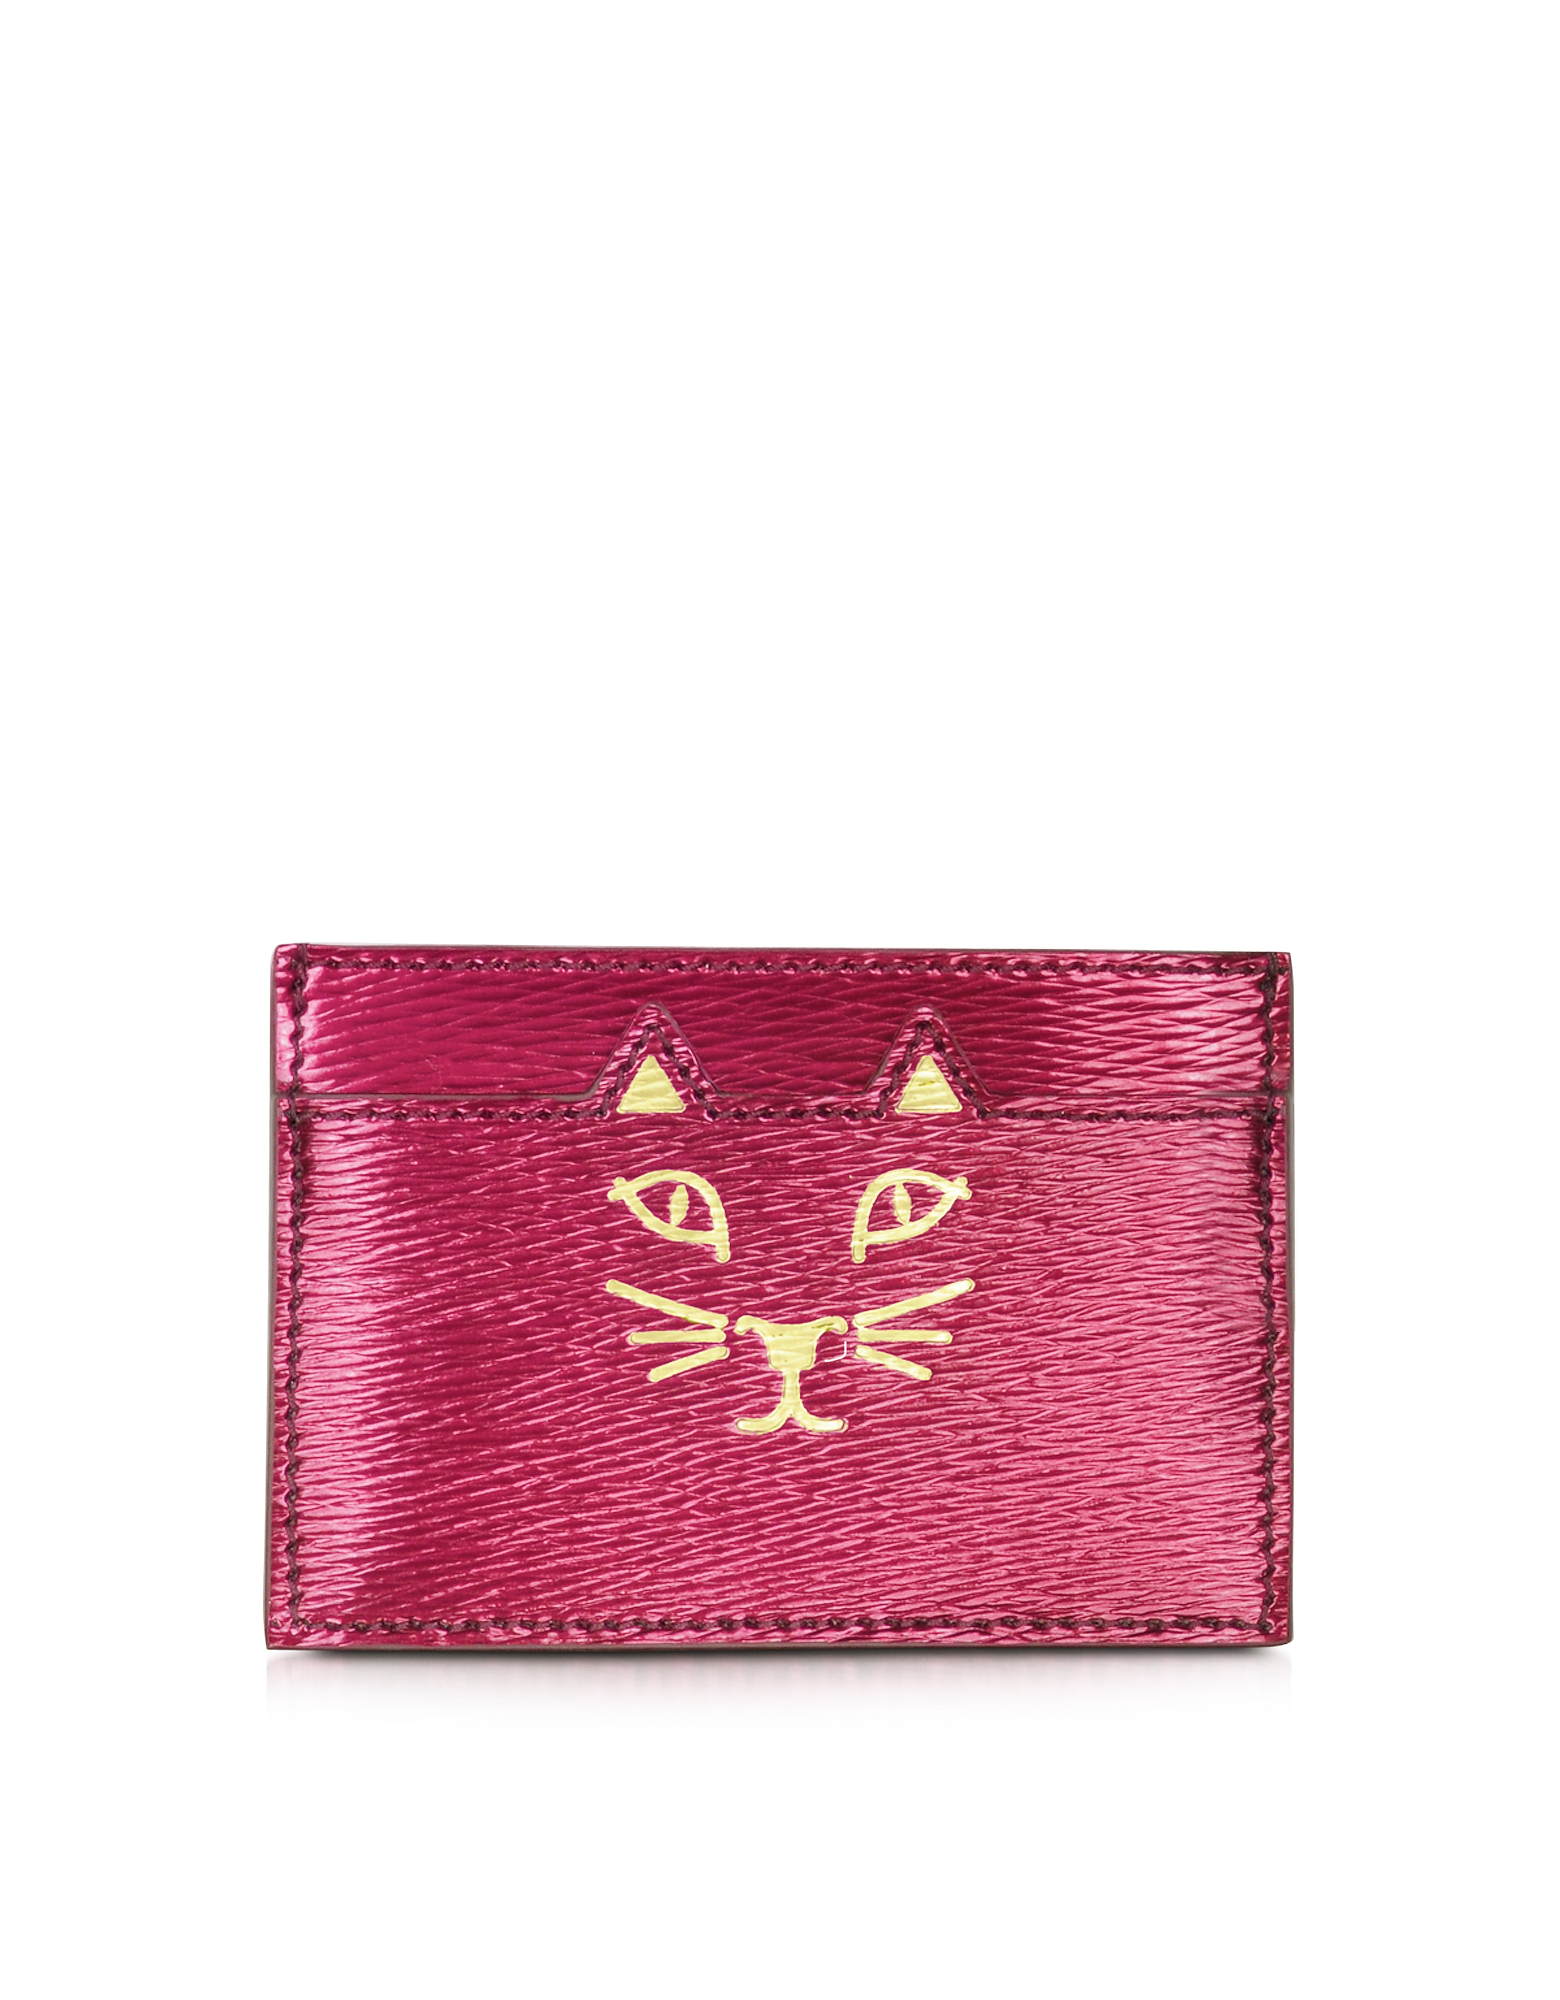 Feline - Бумажник для Карточек из Кожи Металлик Оттенка Фуксия